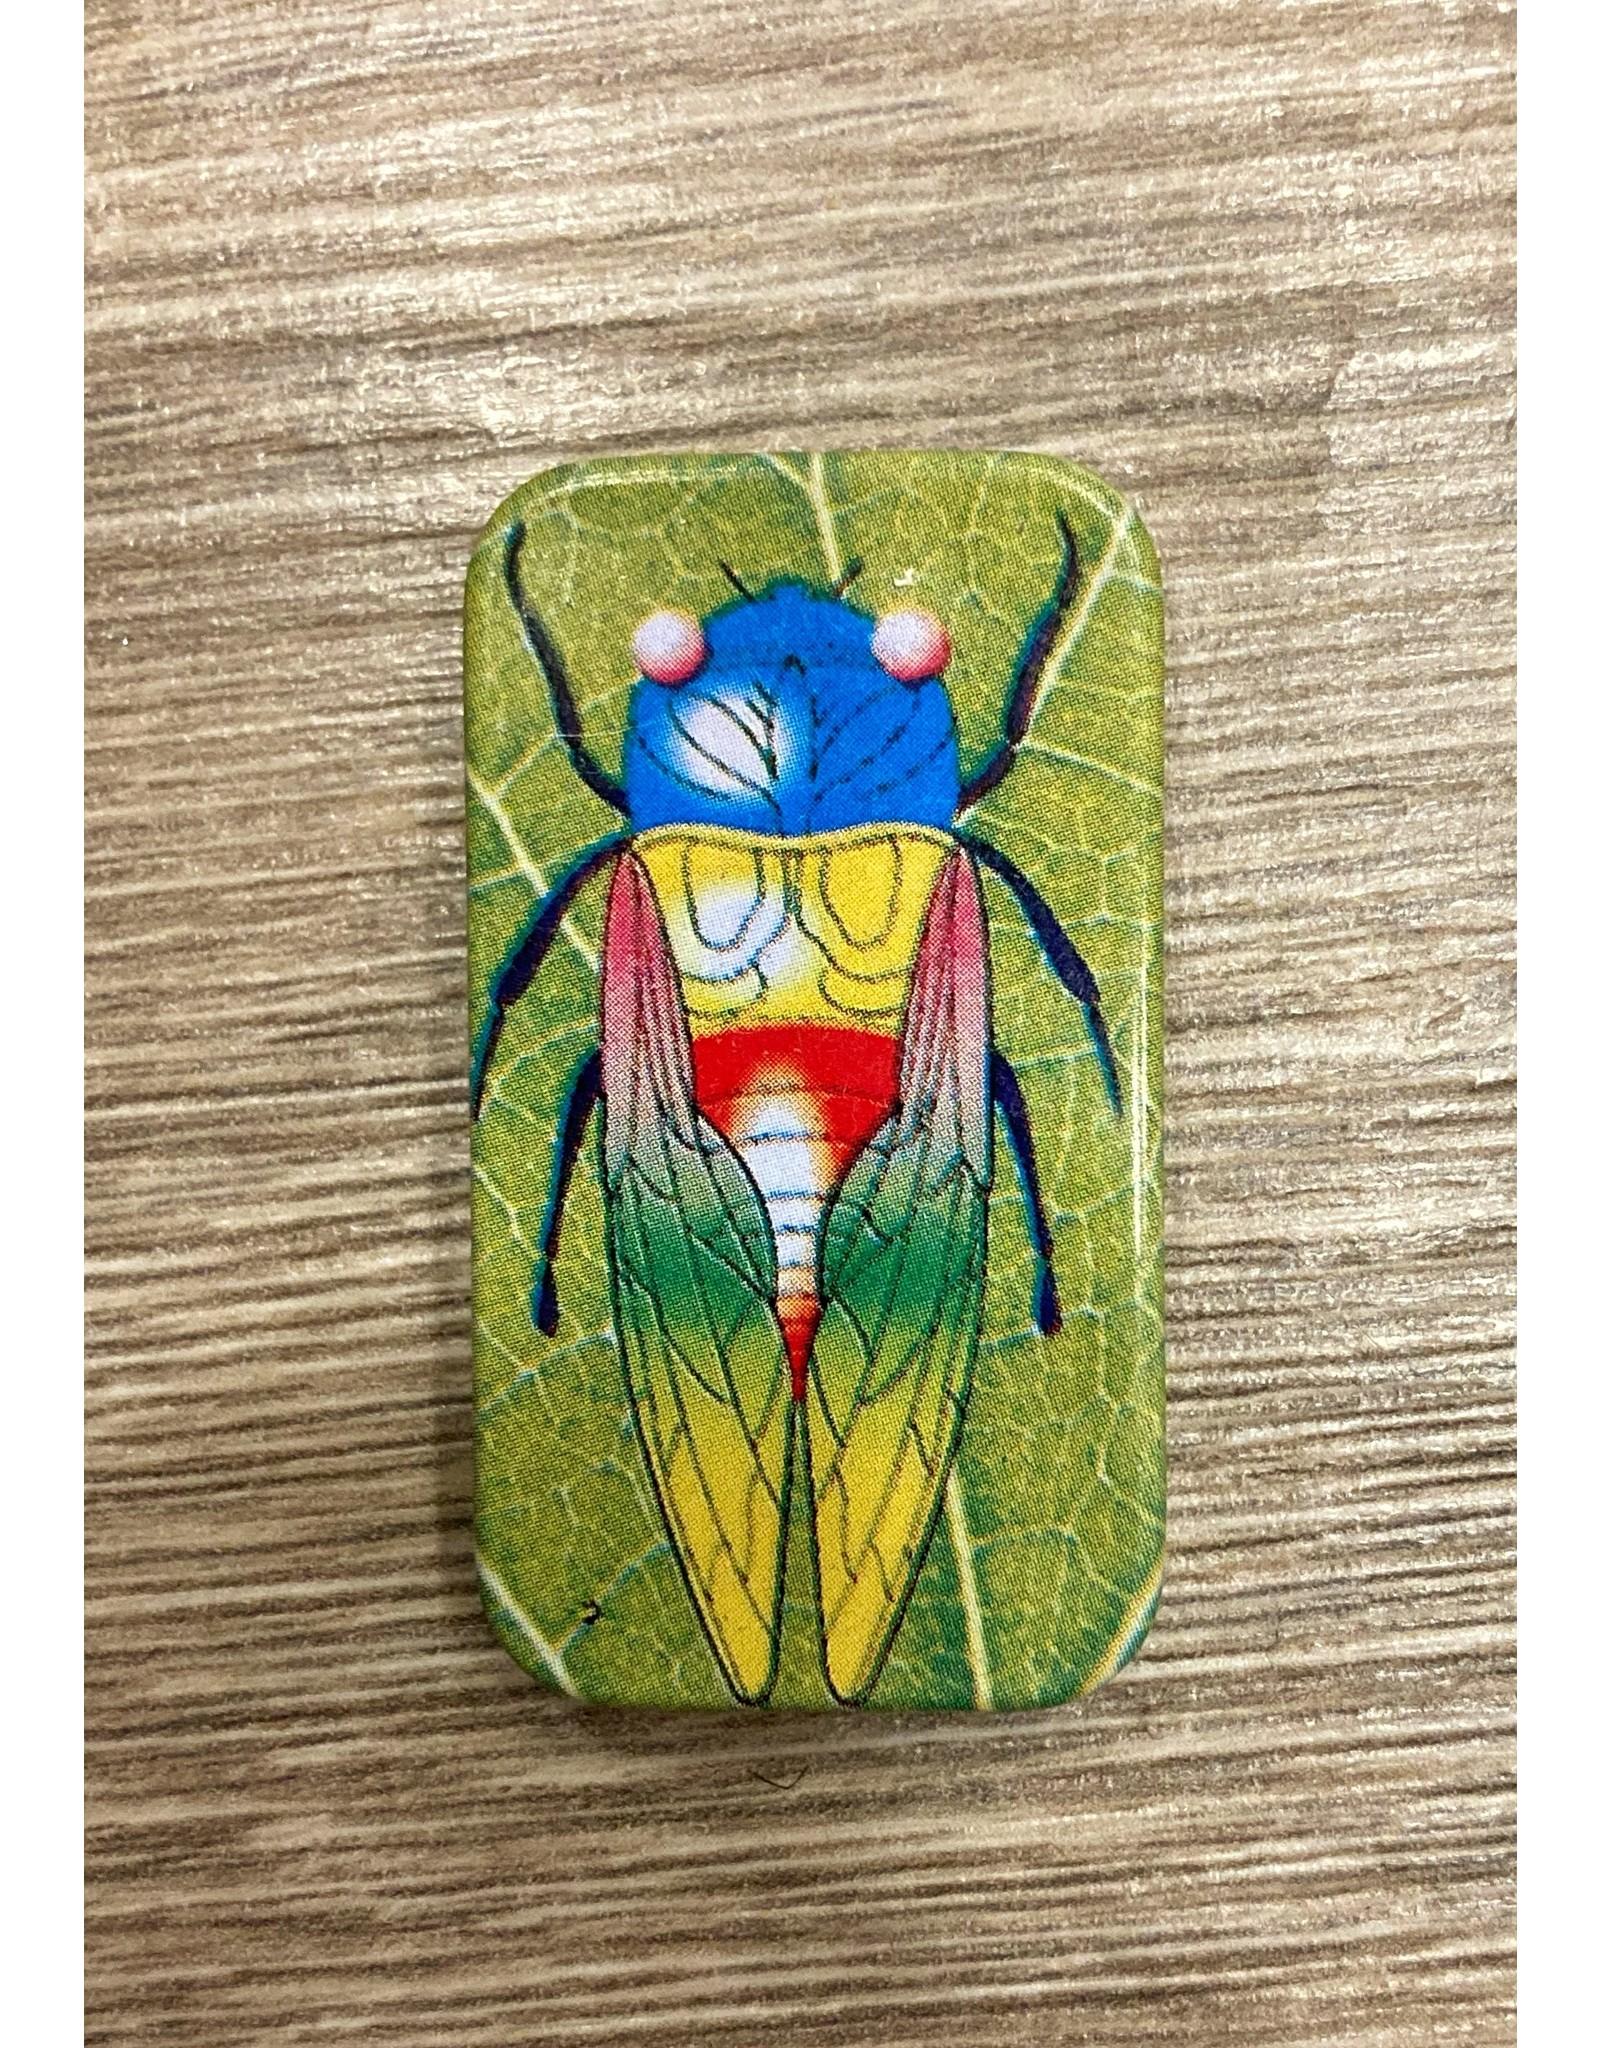 Dan Moi Crackling insect Sebastian KI-15